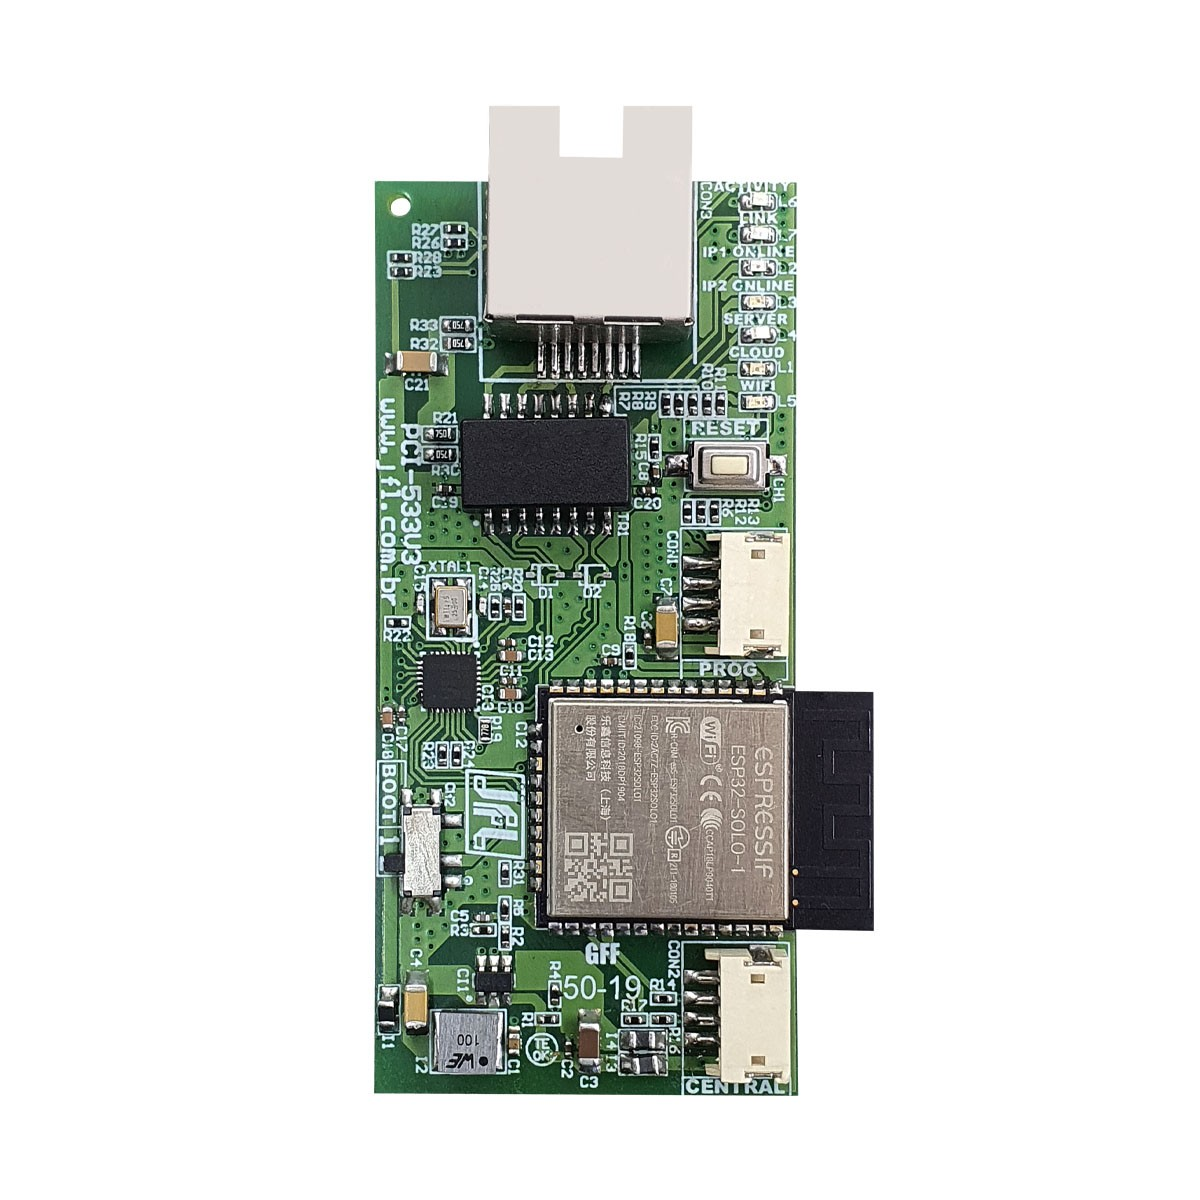 Central Active 20 Ultra Jfl Com Modulo Ethernet, Pgm e Mrf 01